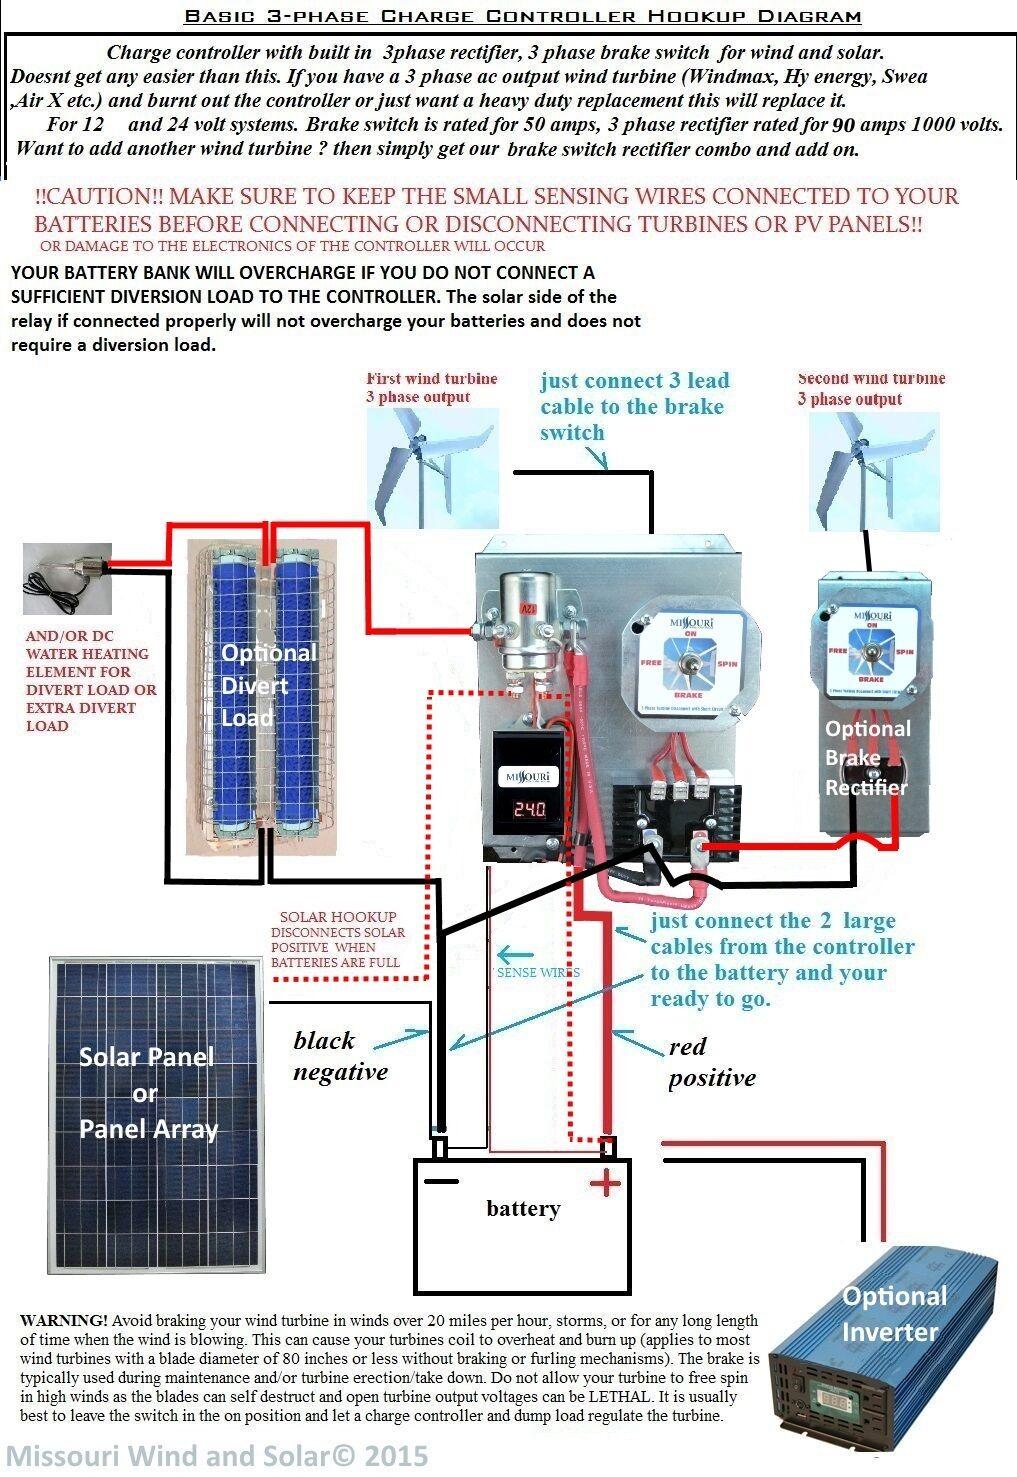 12 volt cigarette lighter wiring diagram sense of touch centurion 3000 power converter troubleshooting ...